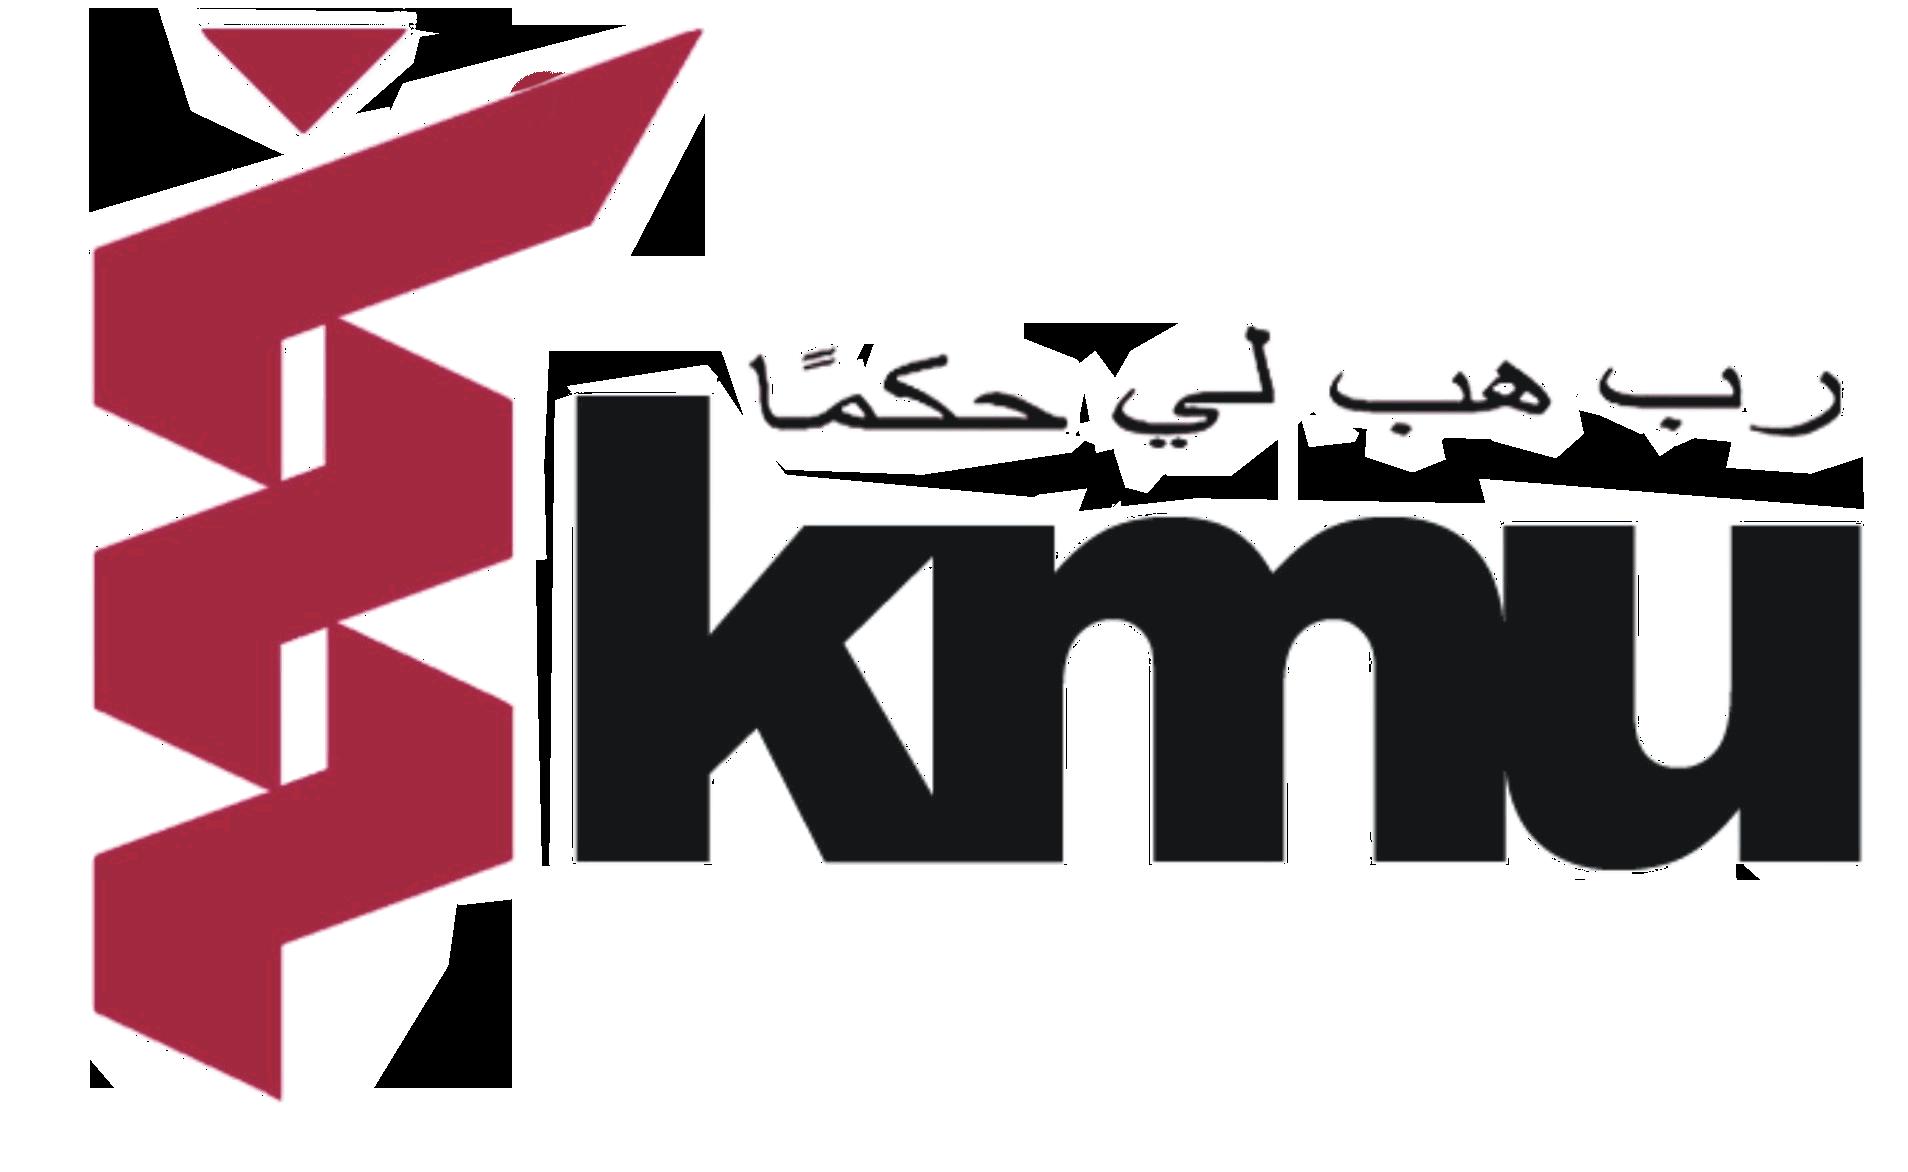 KMU Peshawar Admissions Spring 2018 Graduate, Postgraduate Form Date